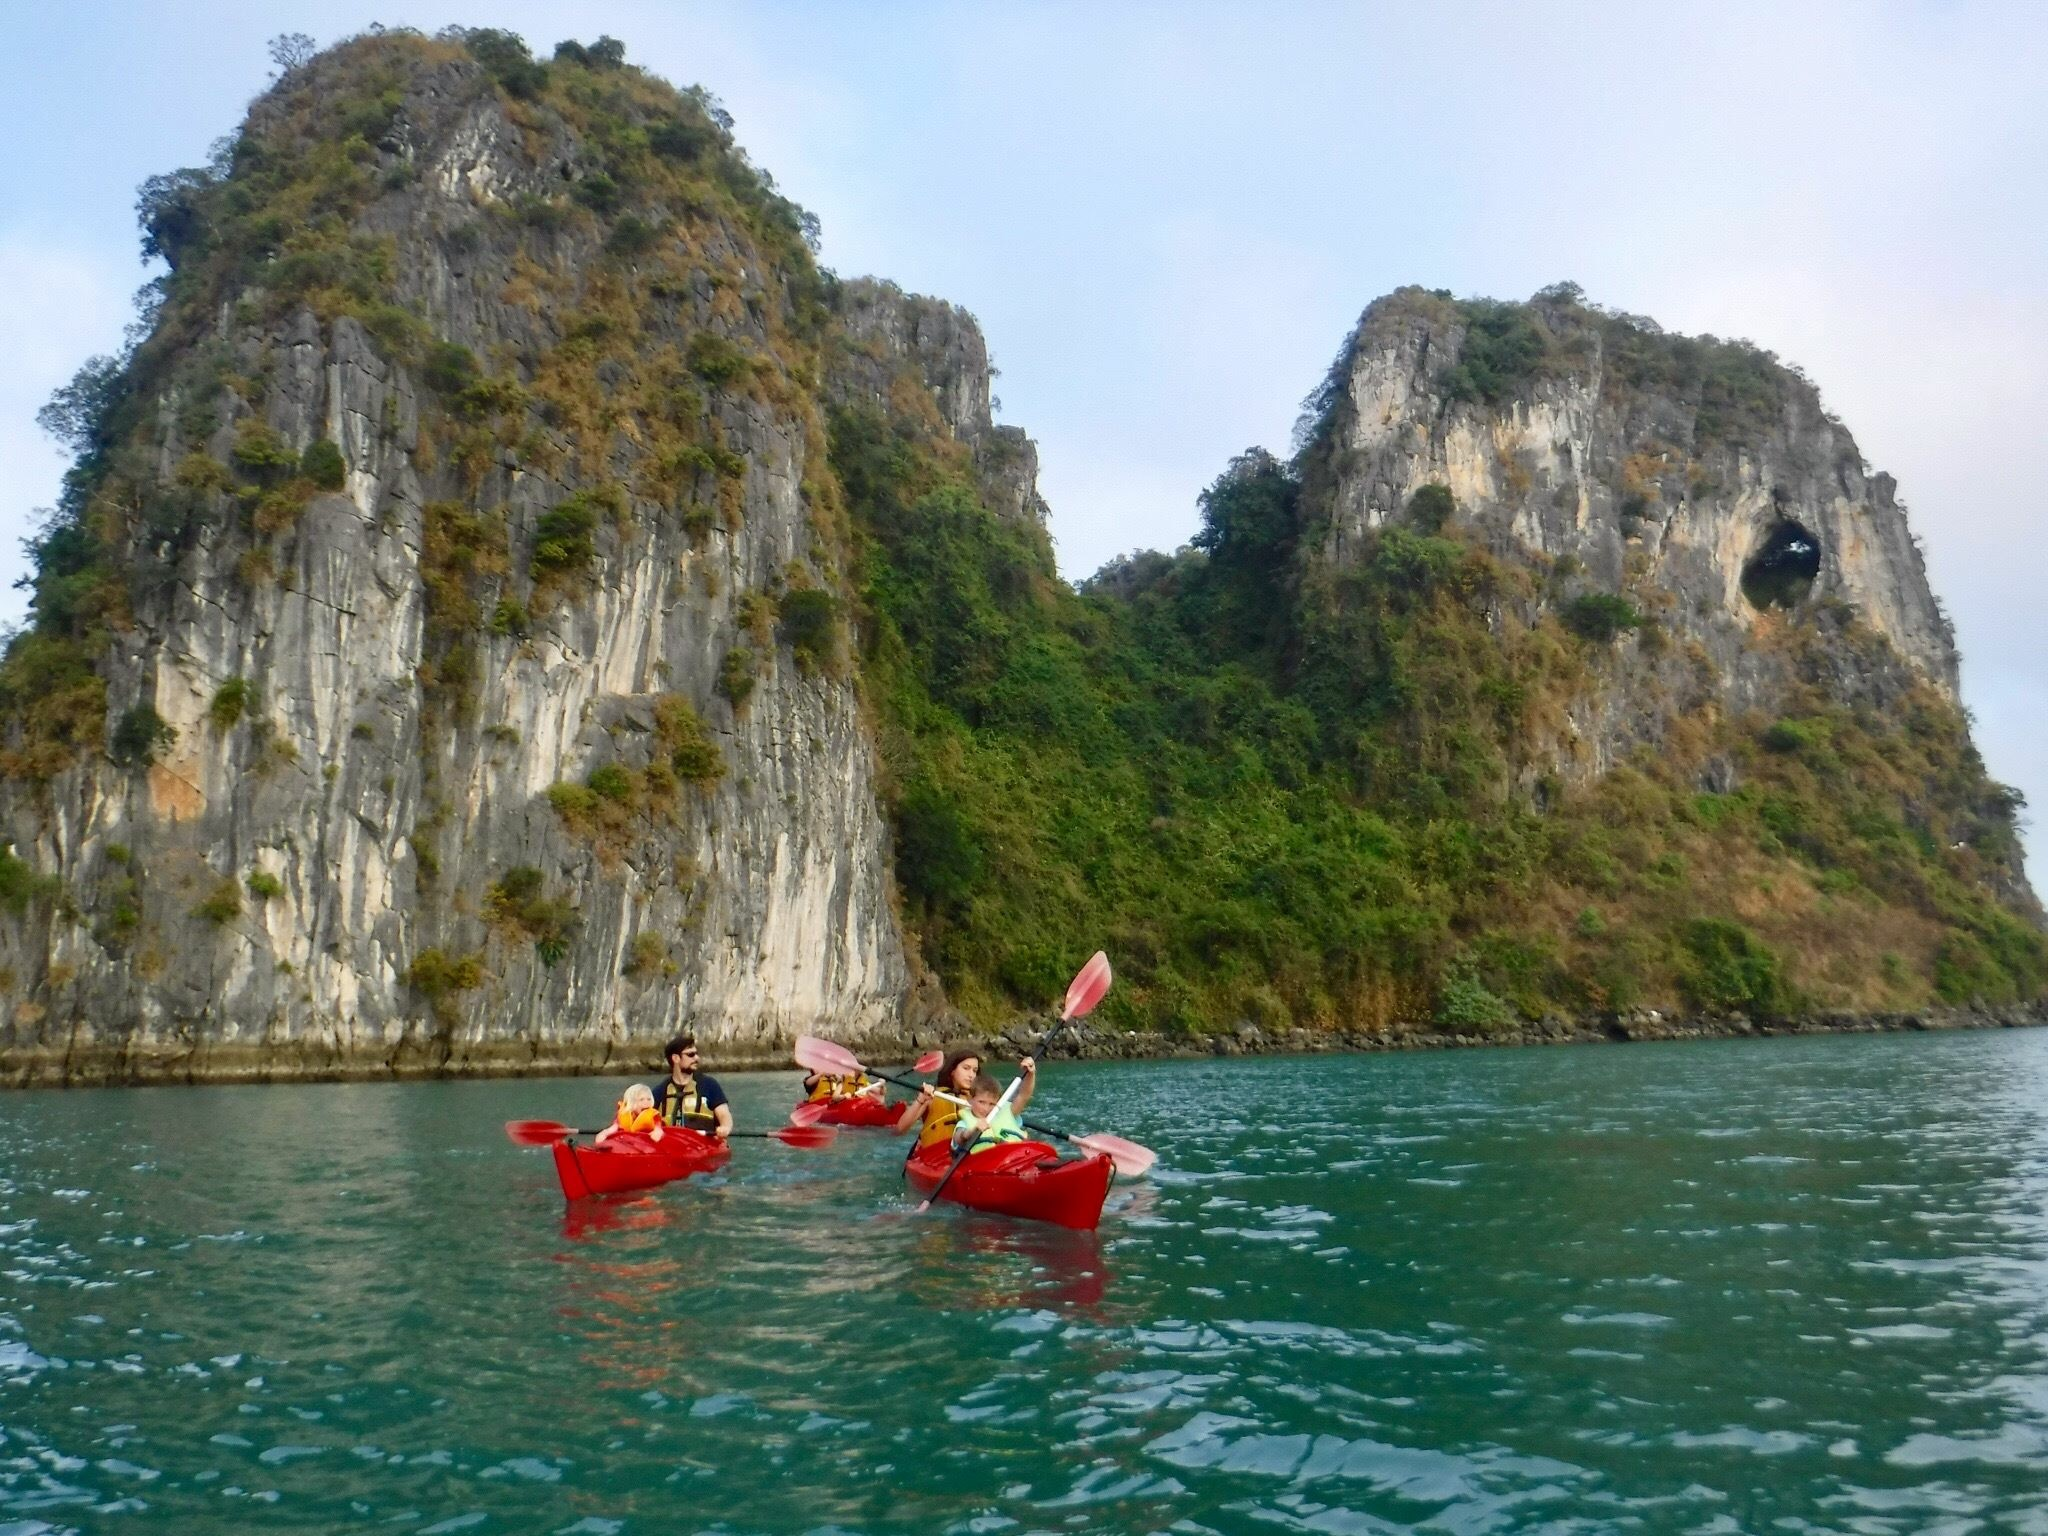 Jon and family kayaking near Elephant Island at the Bai Tu Long Bay World Heritage Site in Vietnam.